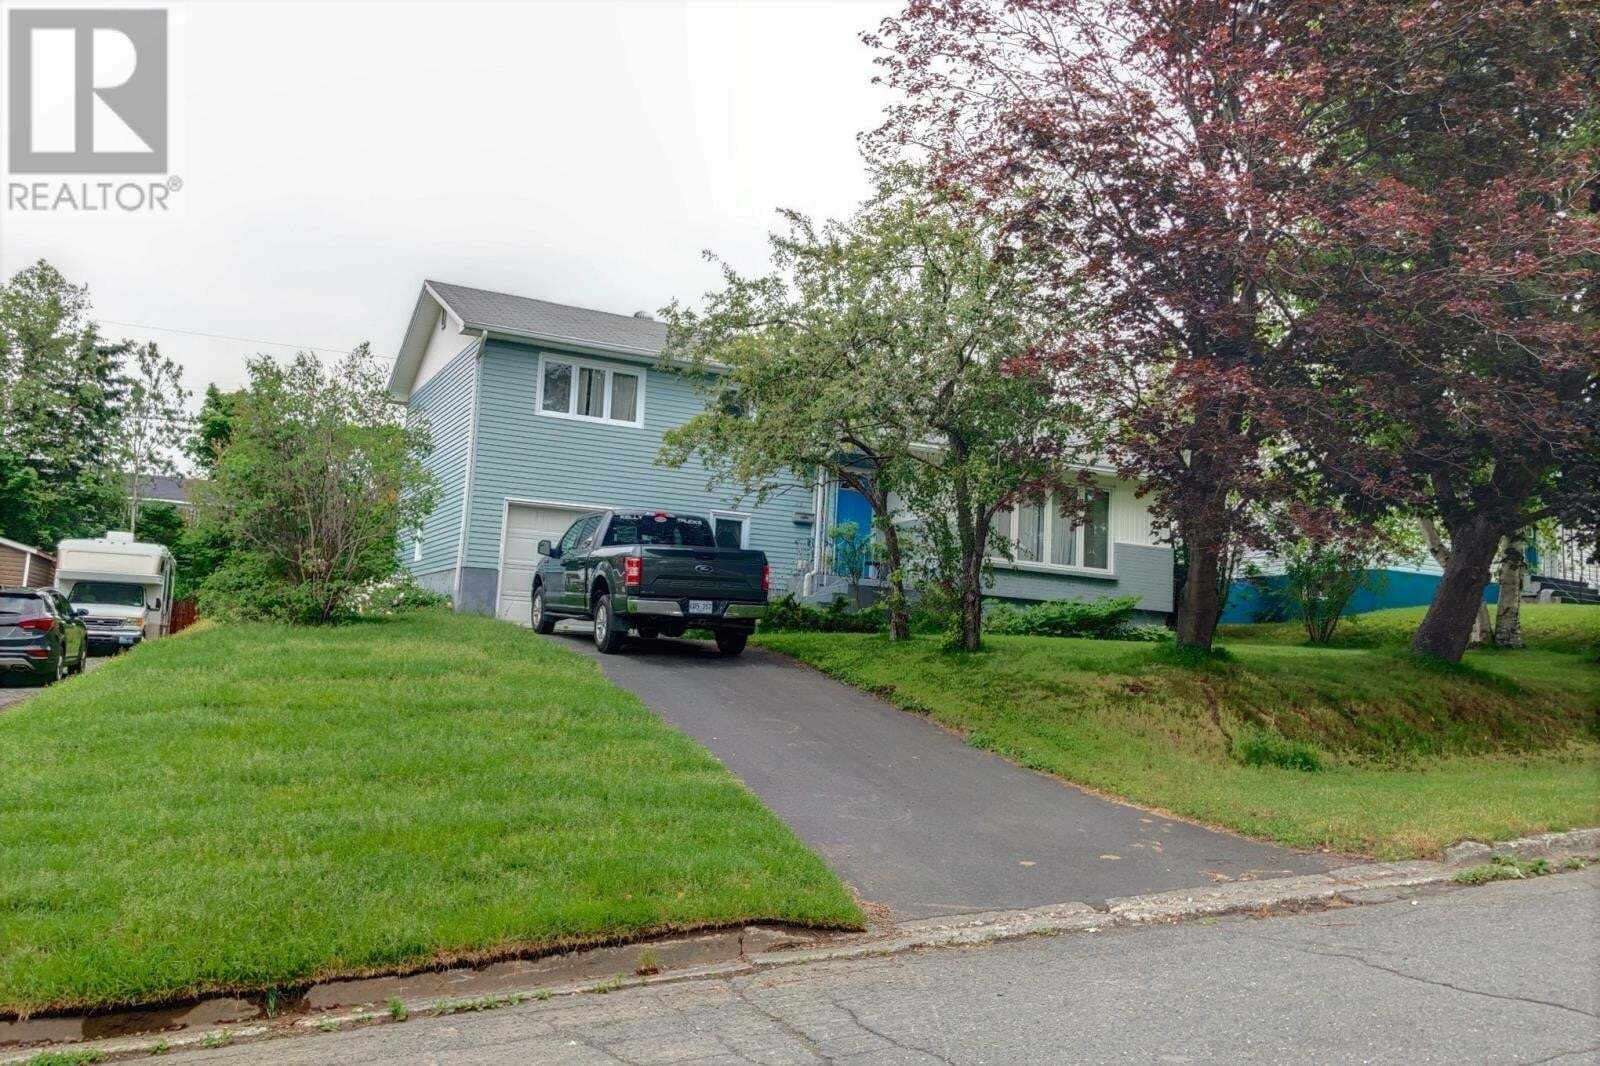 House for sale at 23 Chamberlain St Grand Falls-windsor Newfoundland - MLS: 1216437